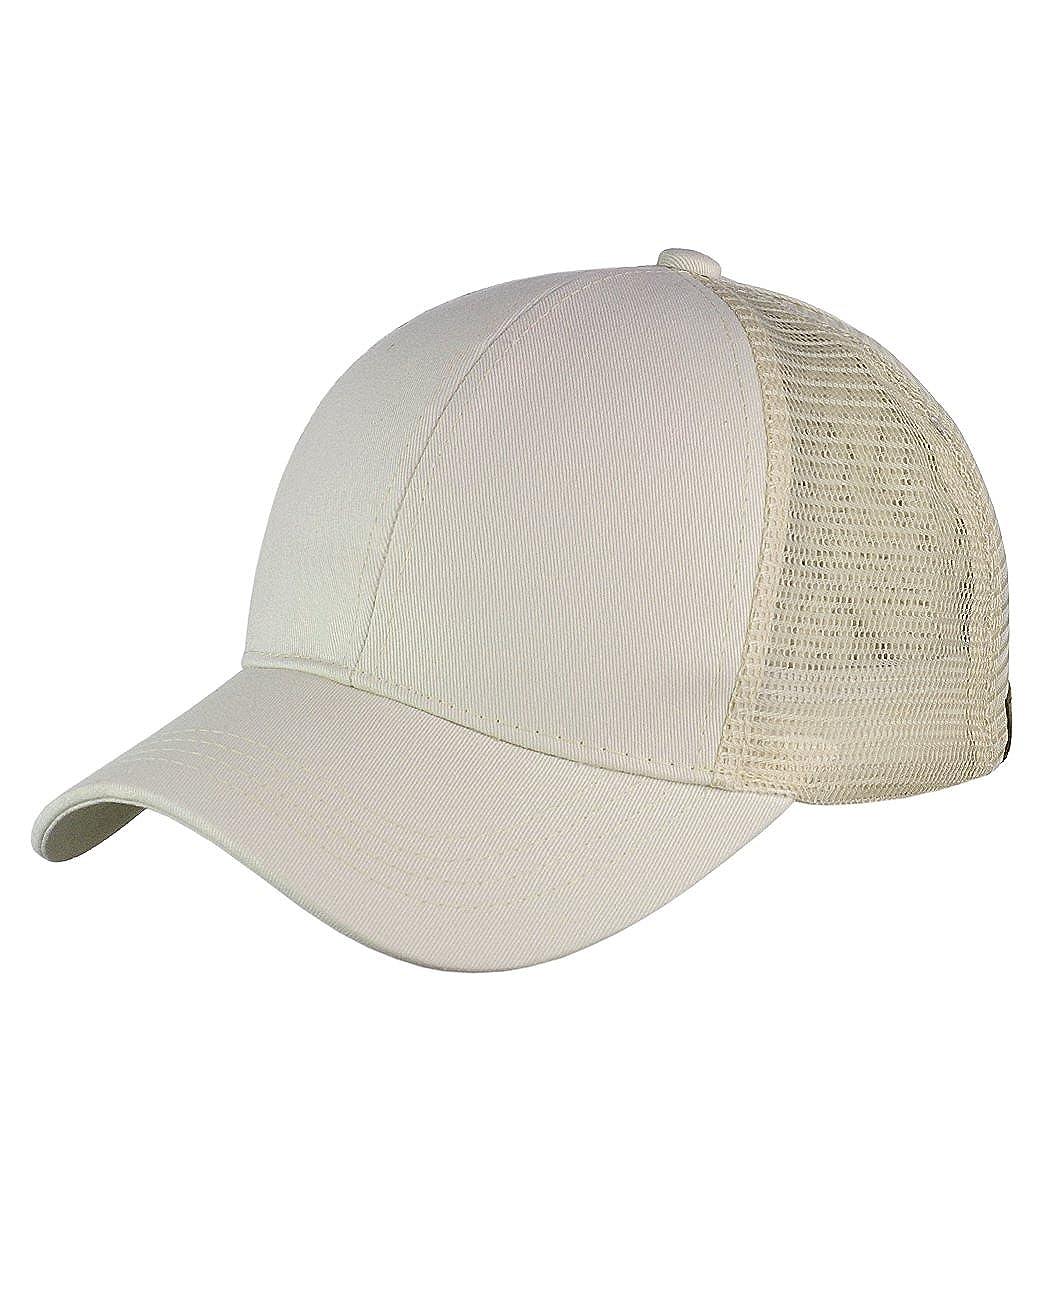 f8c8da88b75 C.C Ponycap Messy High Bun Ponytail Adjustable Mesh Trucker Baseball Cap  Hat